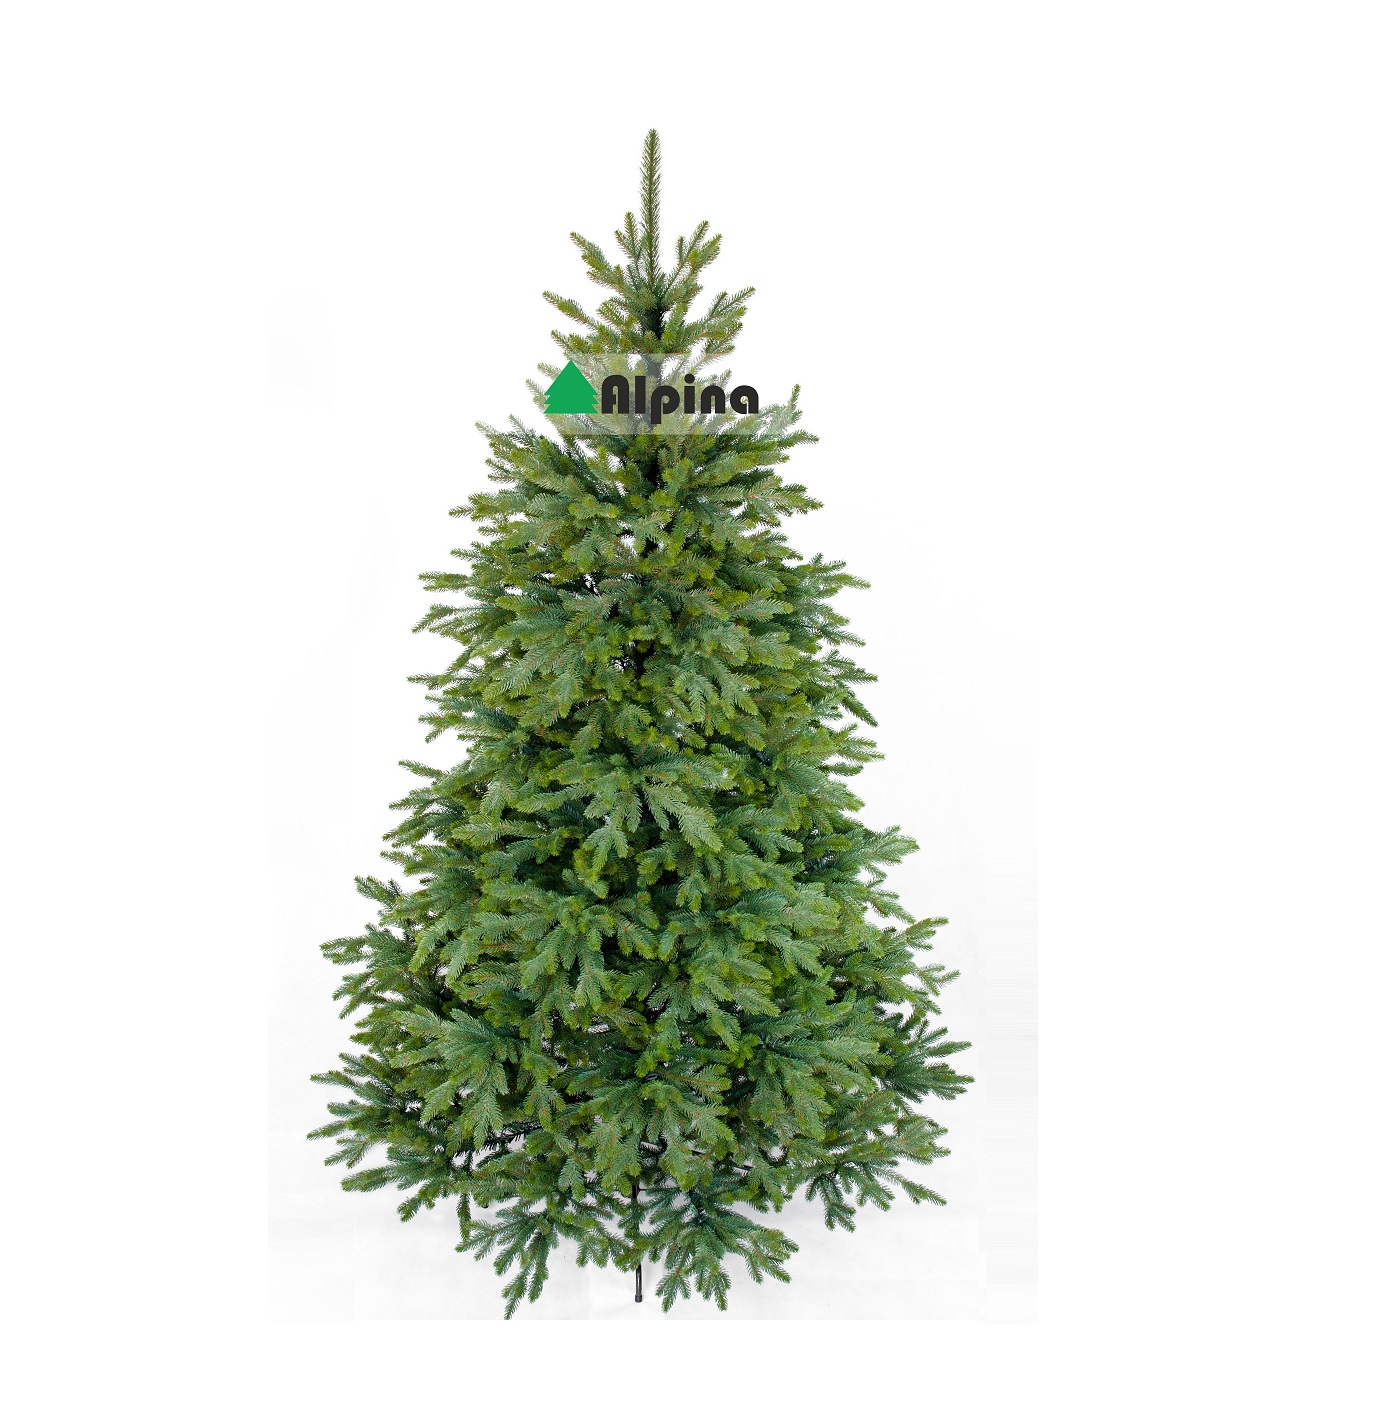 Коледна елха Alpina Смърч 100% PE 250см